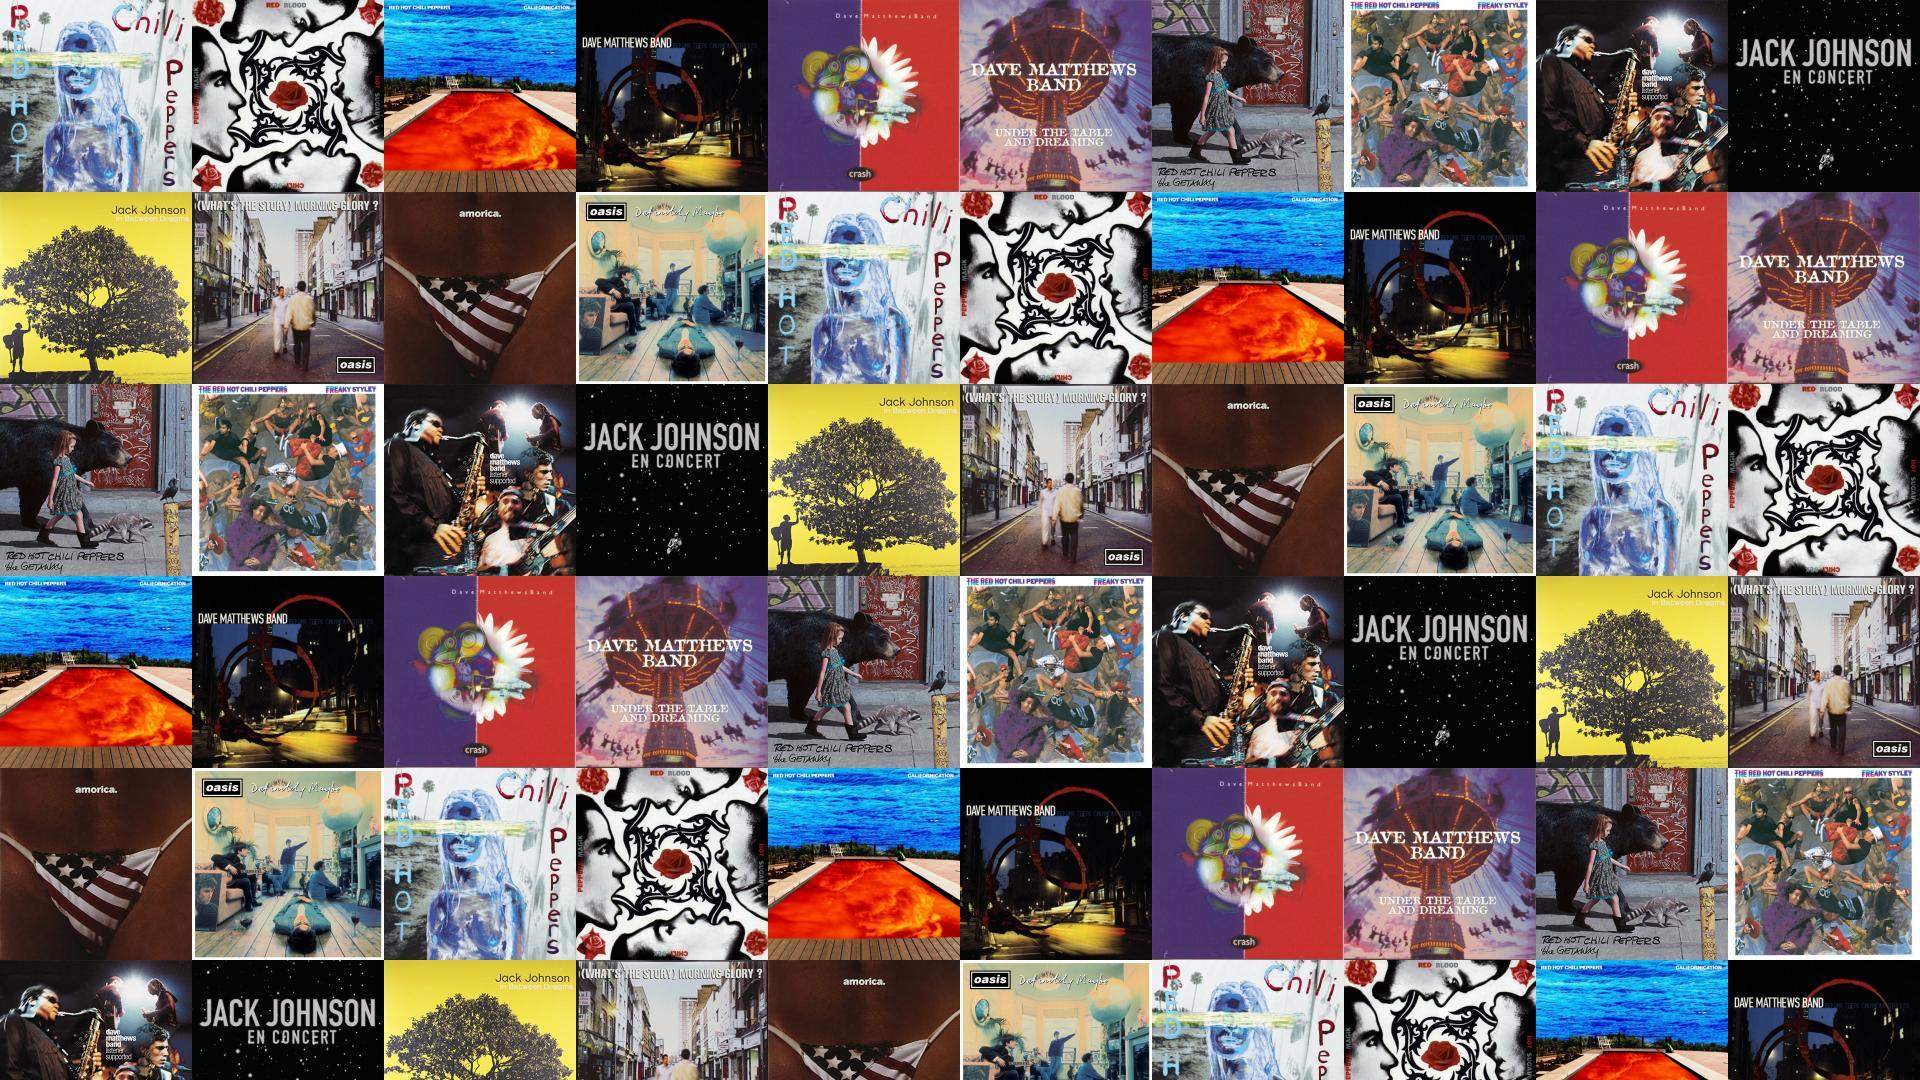 Red Hot Chili Peppers Funk Rock Alternative Wallpaper 1920x1080